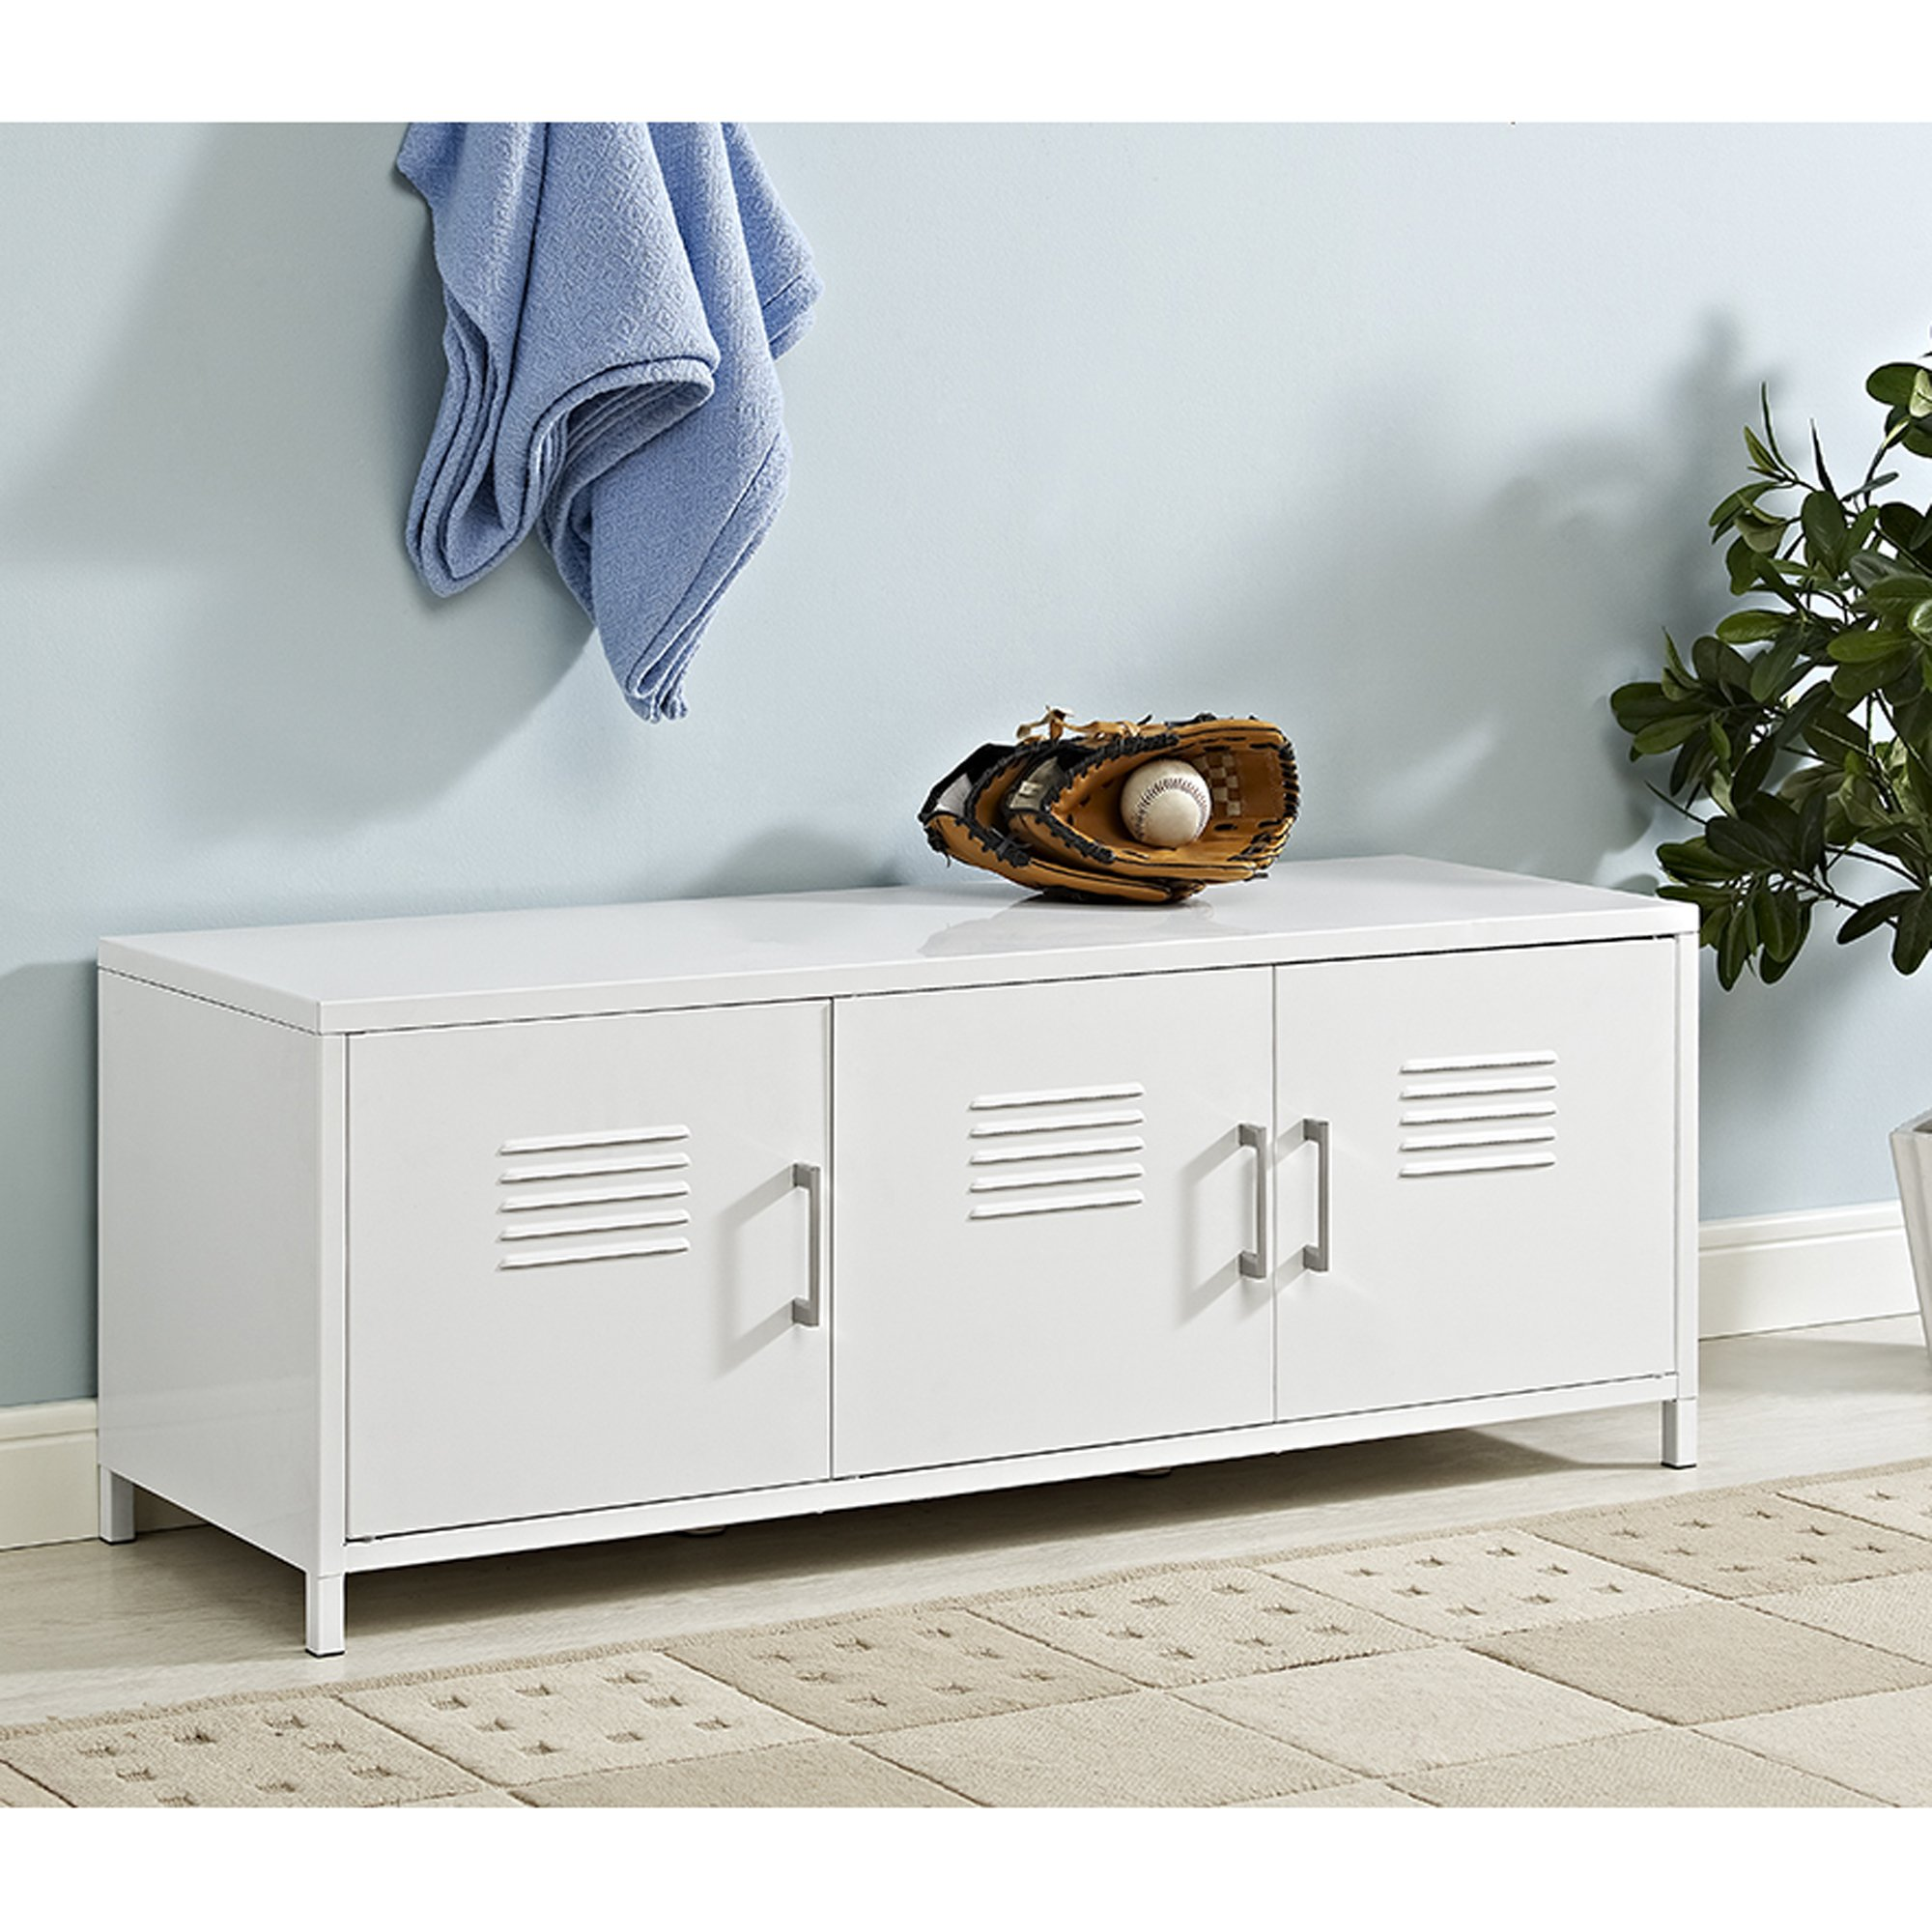 W. Designs 48'' Metal Locker Style Storage Bench White